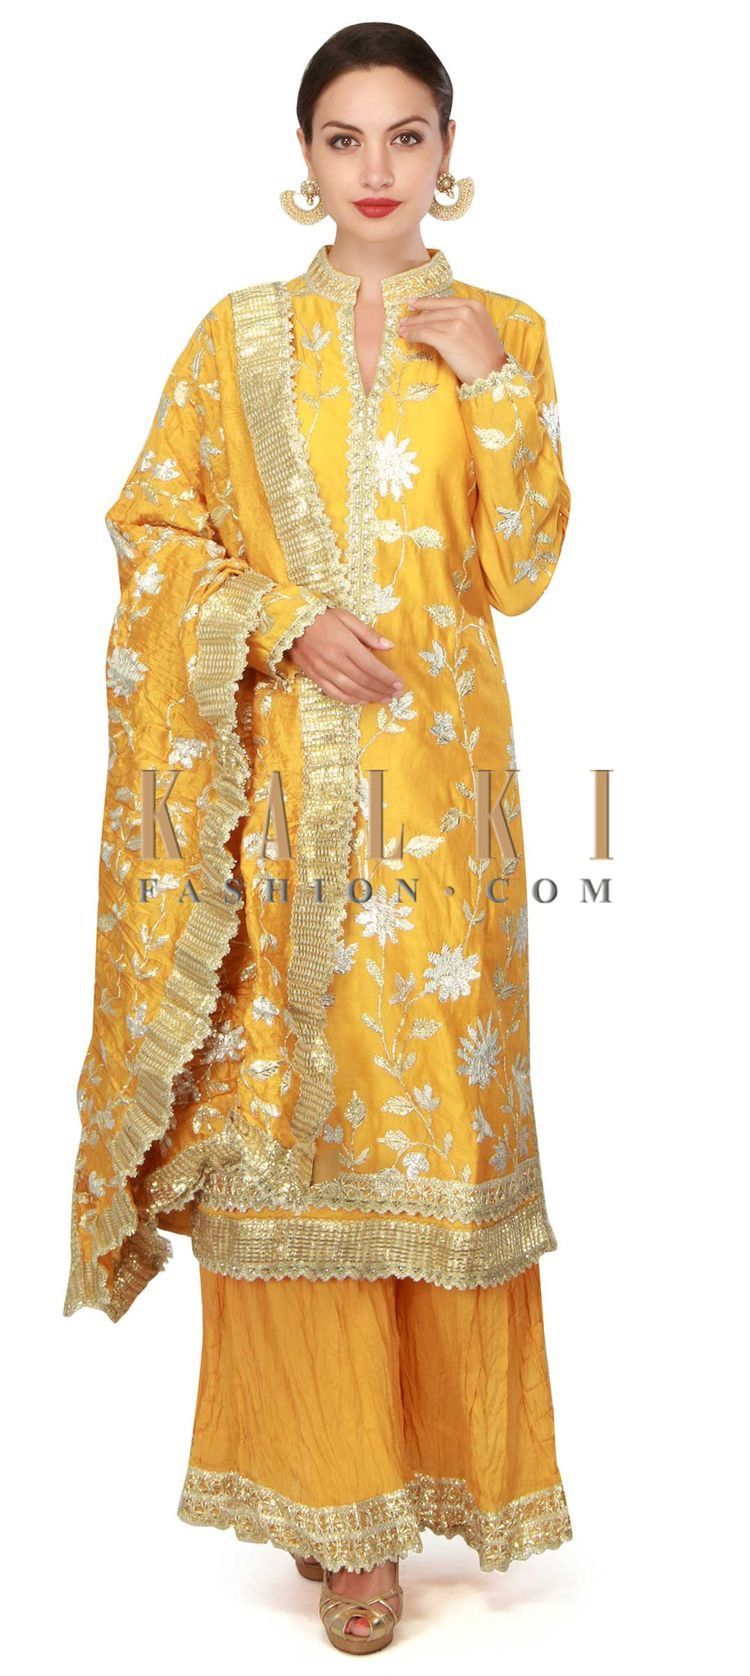 1163314459 Pinterest: @pawank90 | Sharara and Palazzo in 2019 | Yellow suit ...